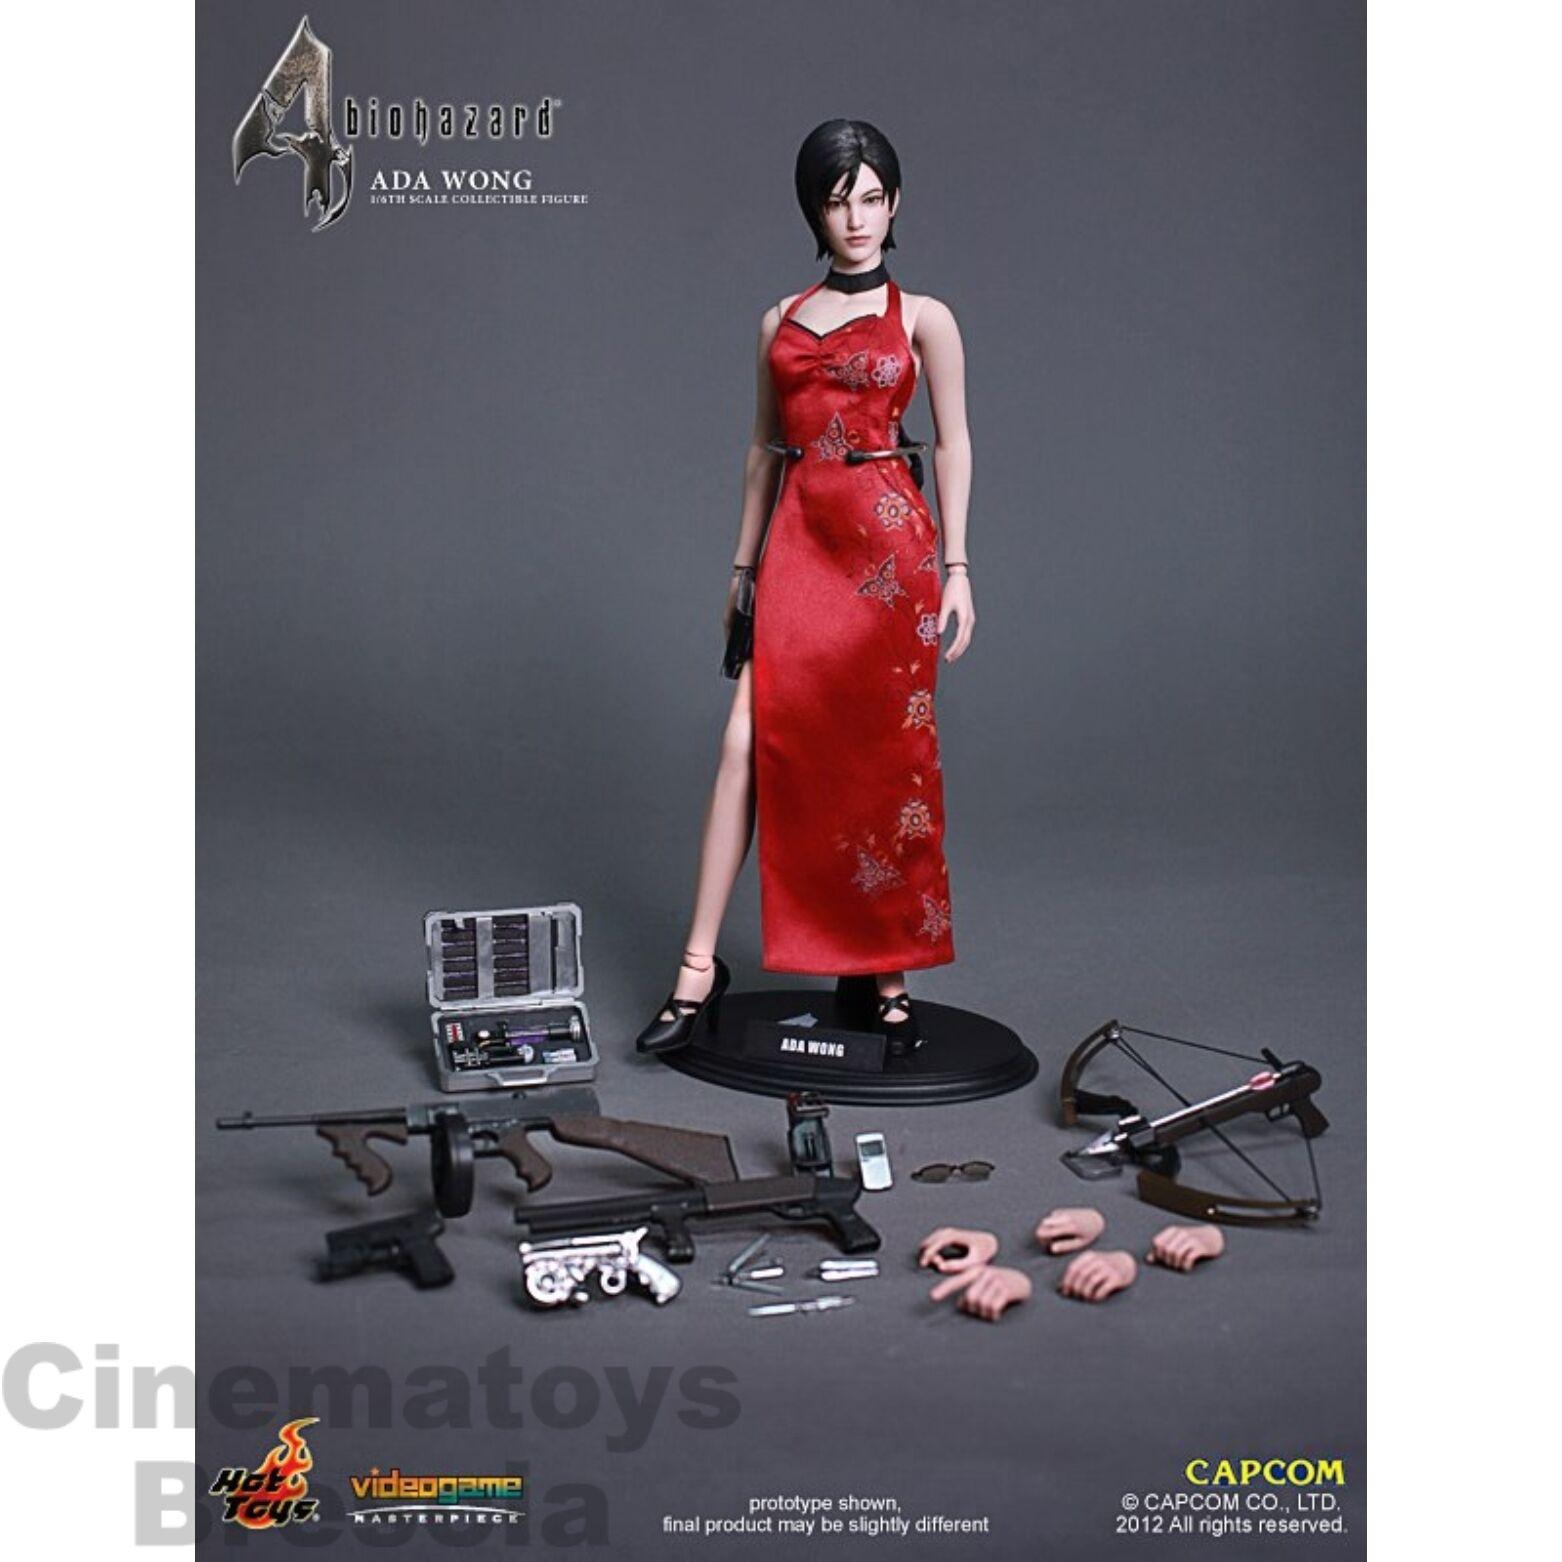 RESIDENT EVIL Ada Wong Sixth Scale Action Figure Figure Figure Hot Toys VideoGame Masterpiece 3ec8c3